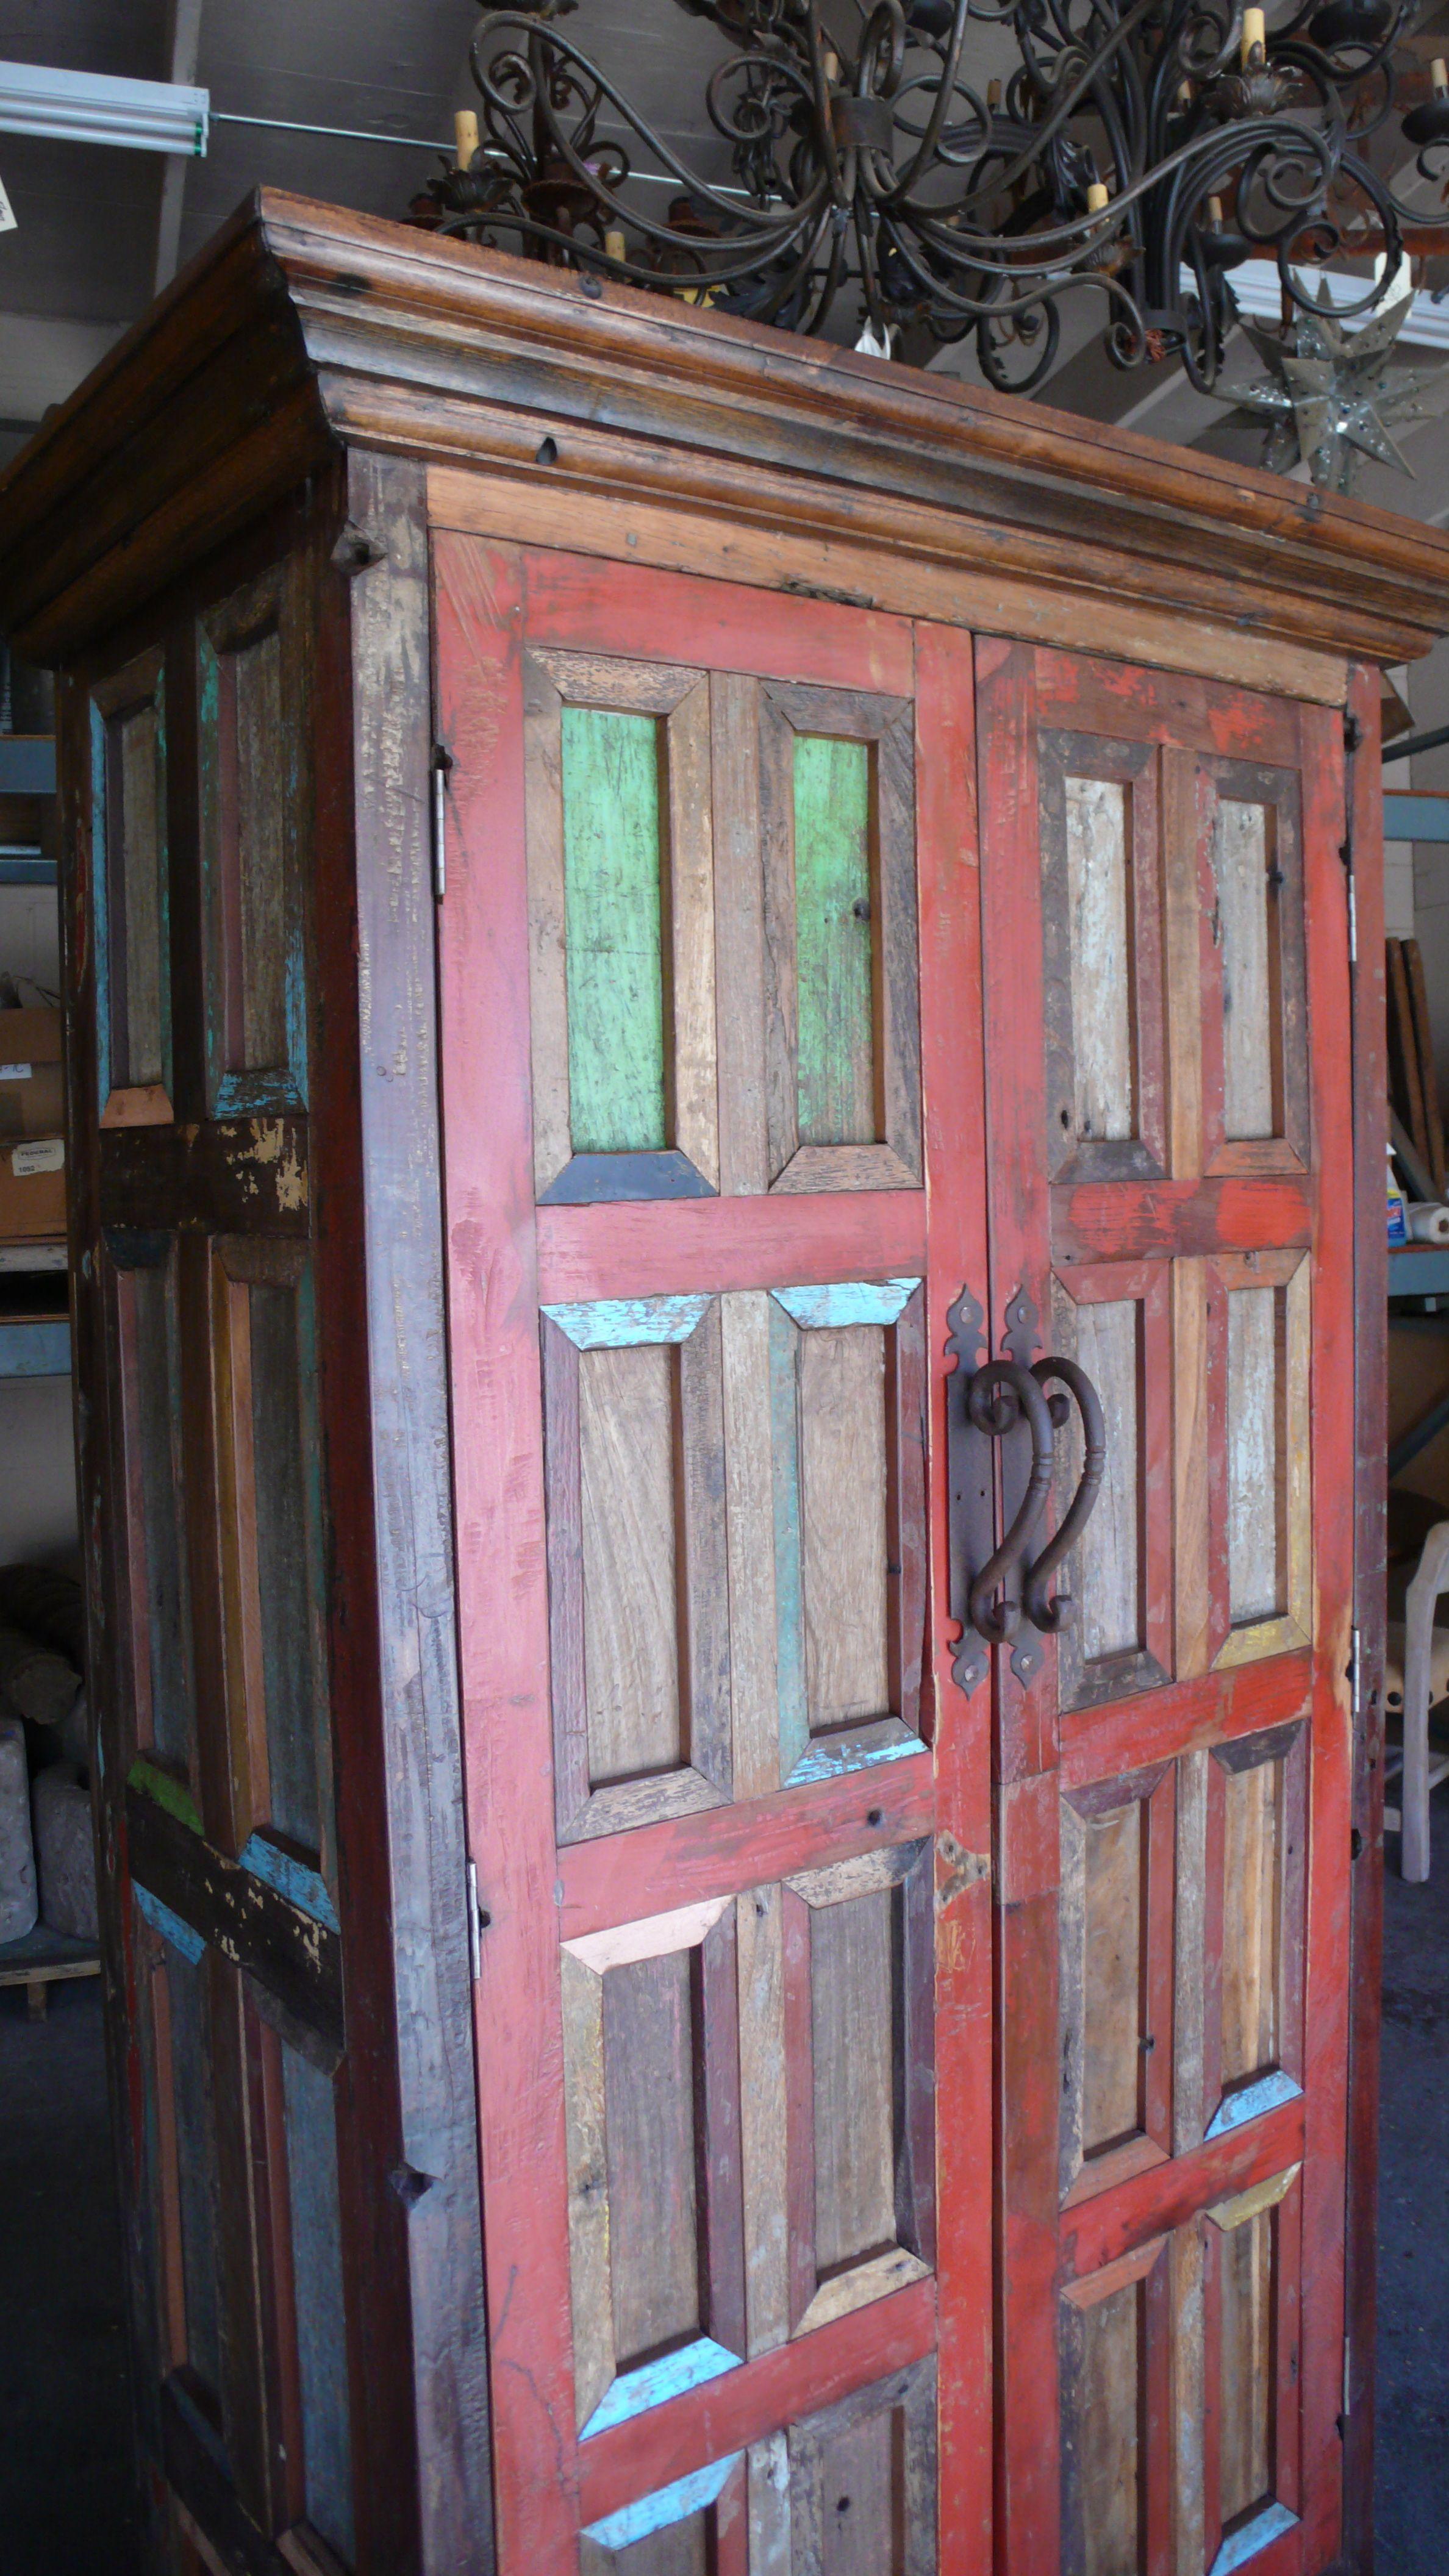 Farmhouse Painted Furniture